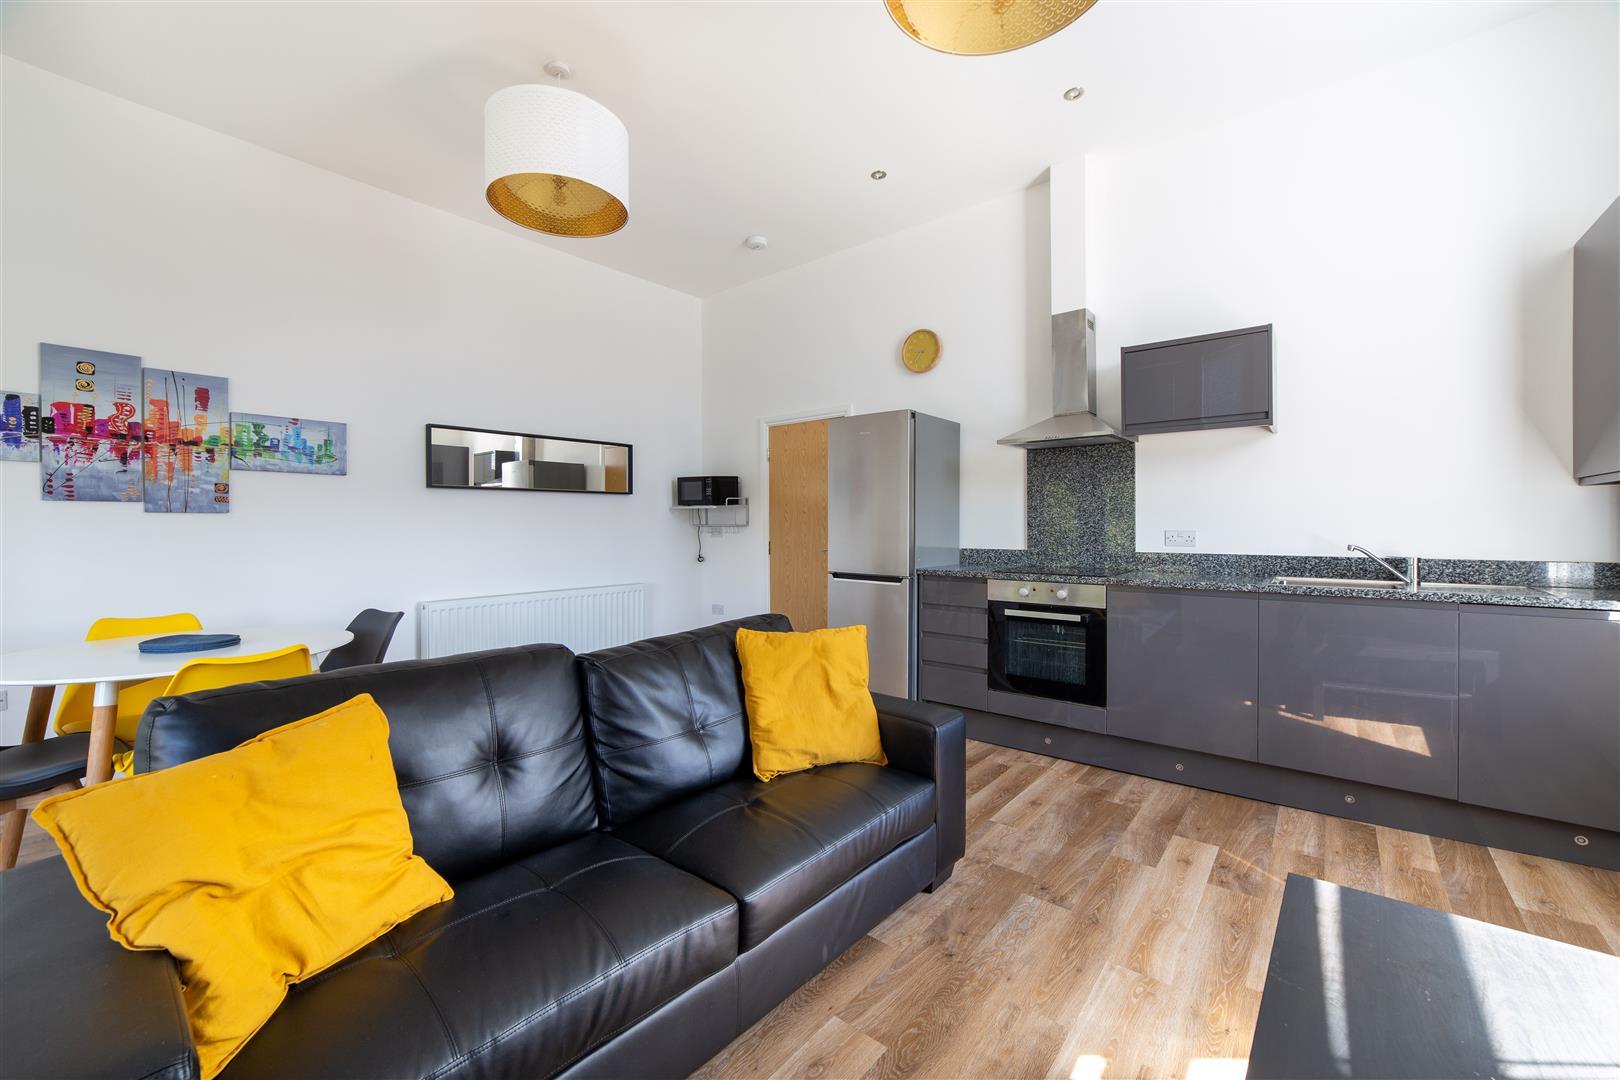 2 bed apartment to rent in Newcastle Upon Tyne, NE2 1NE, NE2